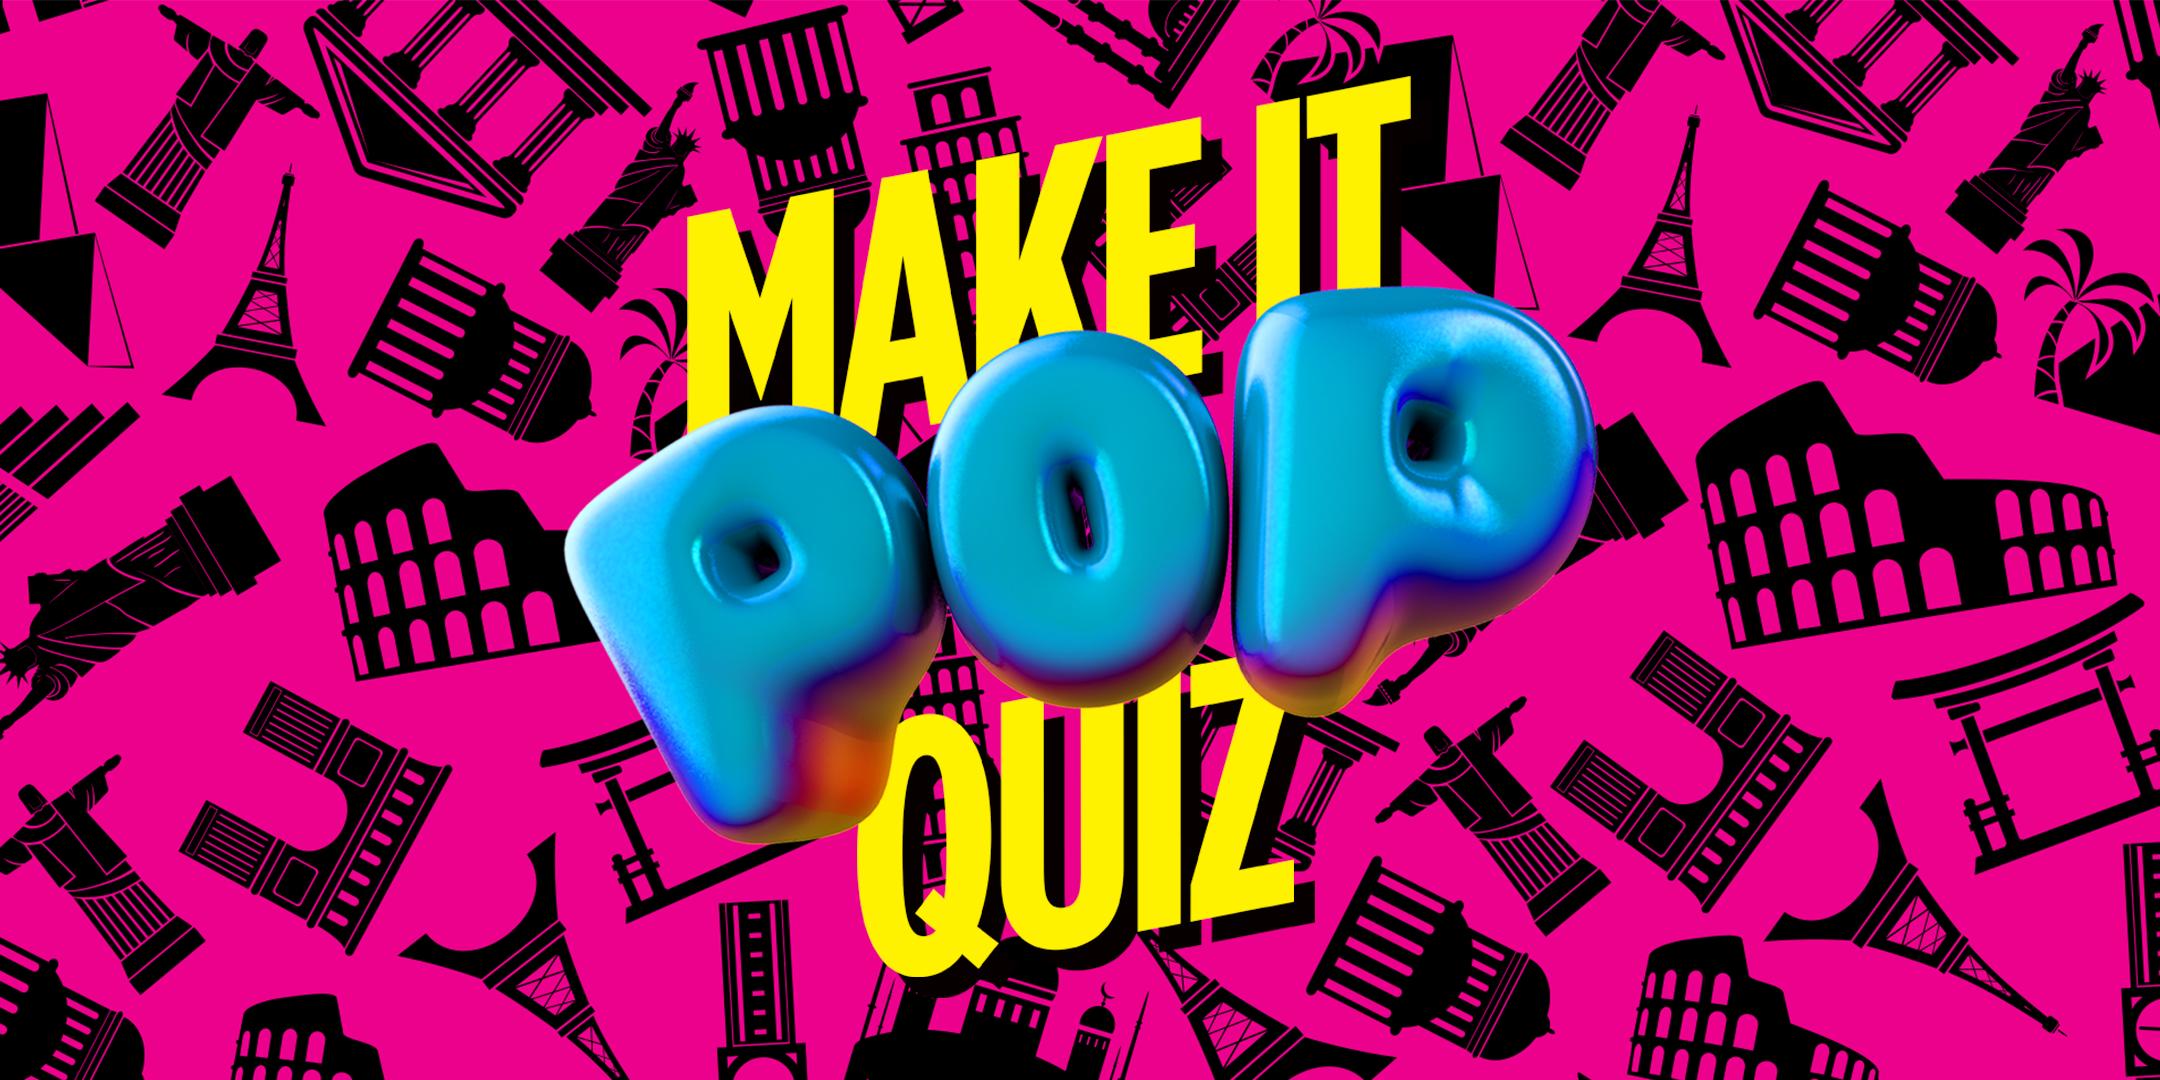 MAKE IT POP! QUIZ - Global Styles